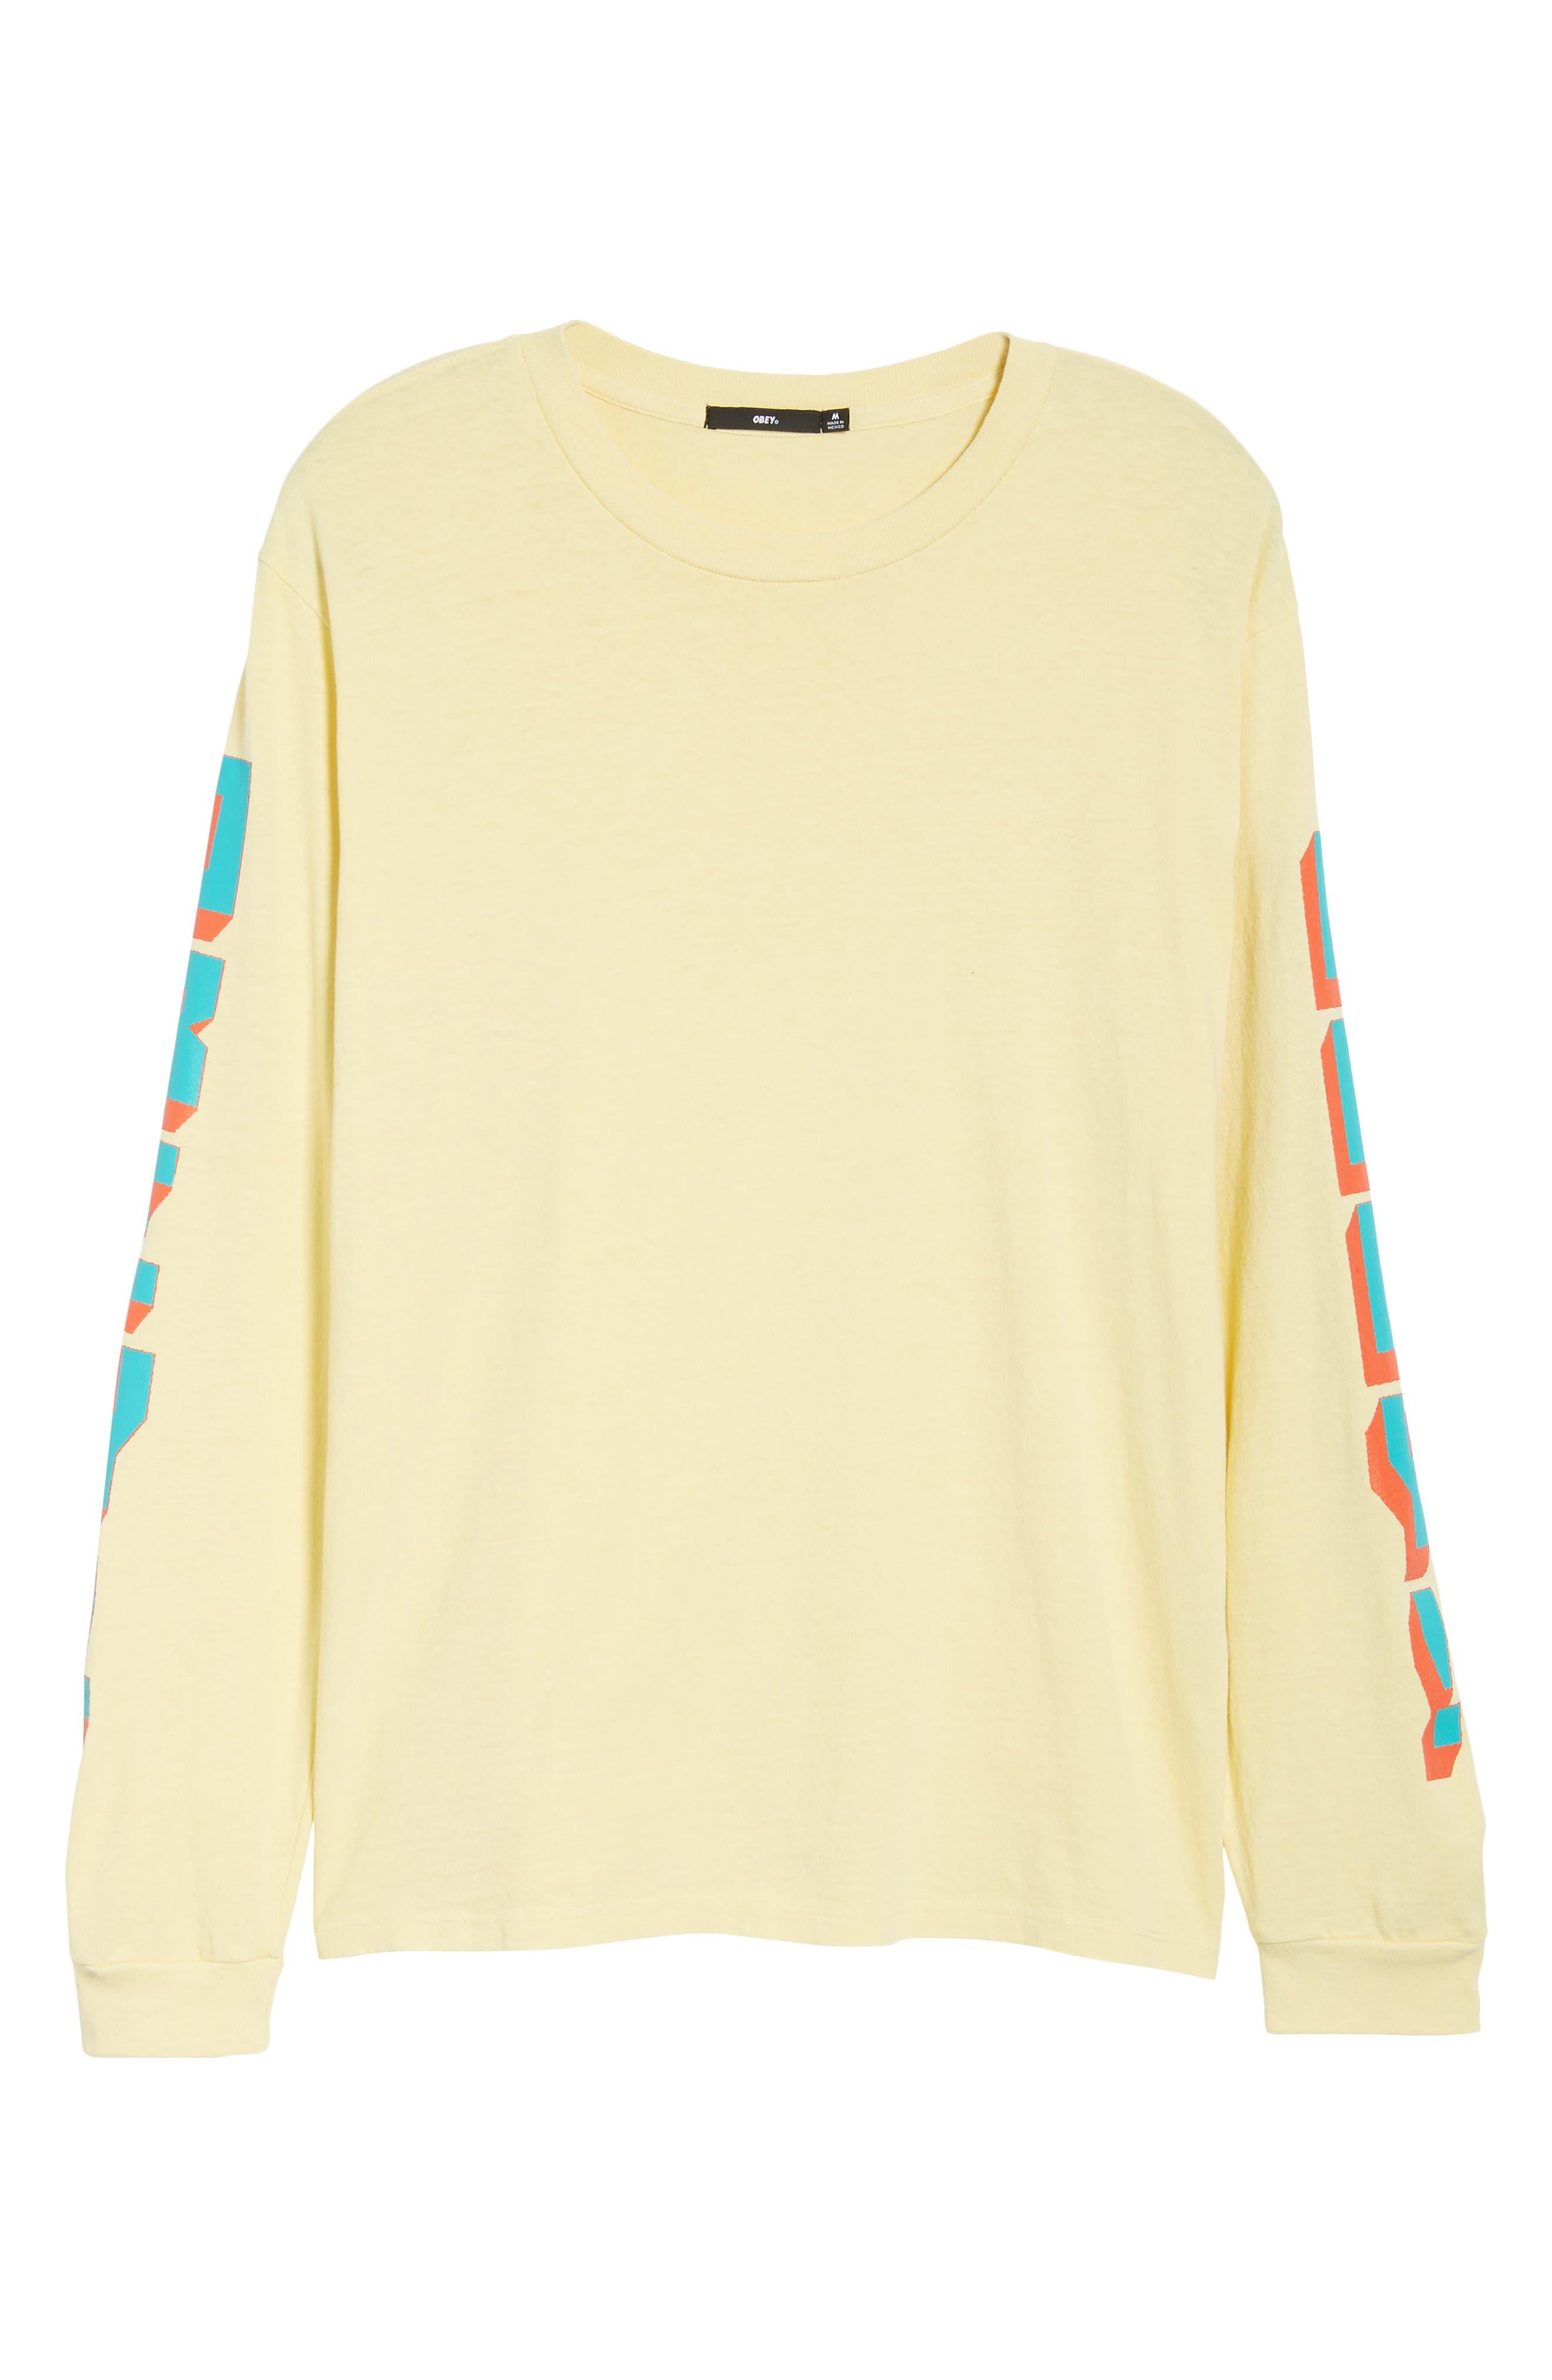 New World II Pigment T-Shirt,                             Alternate thumbnail 6, color,                             Dusty Lemon